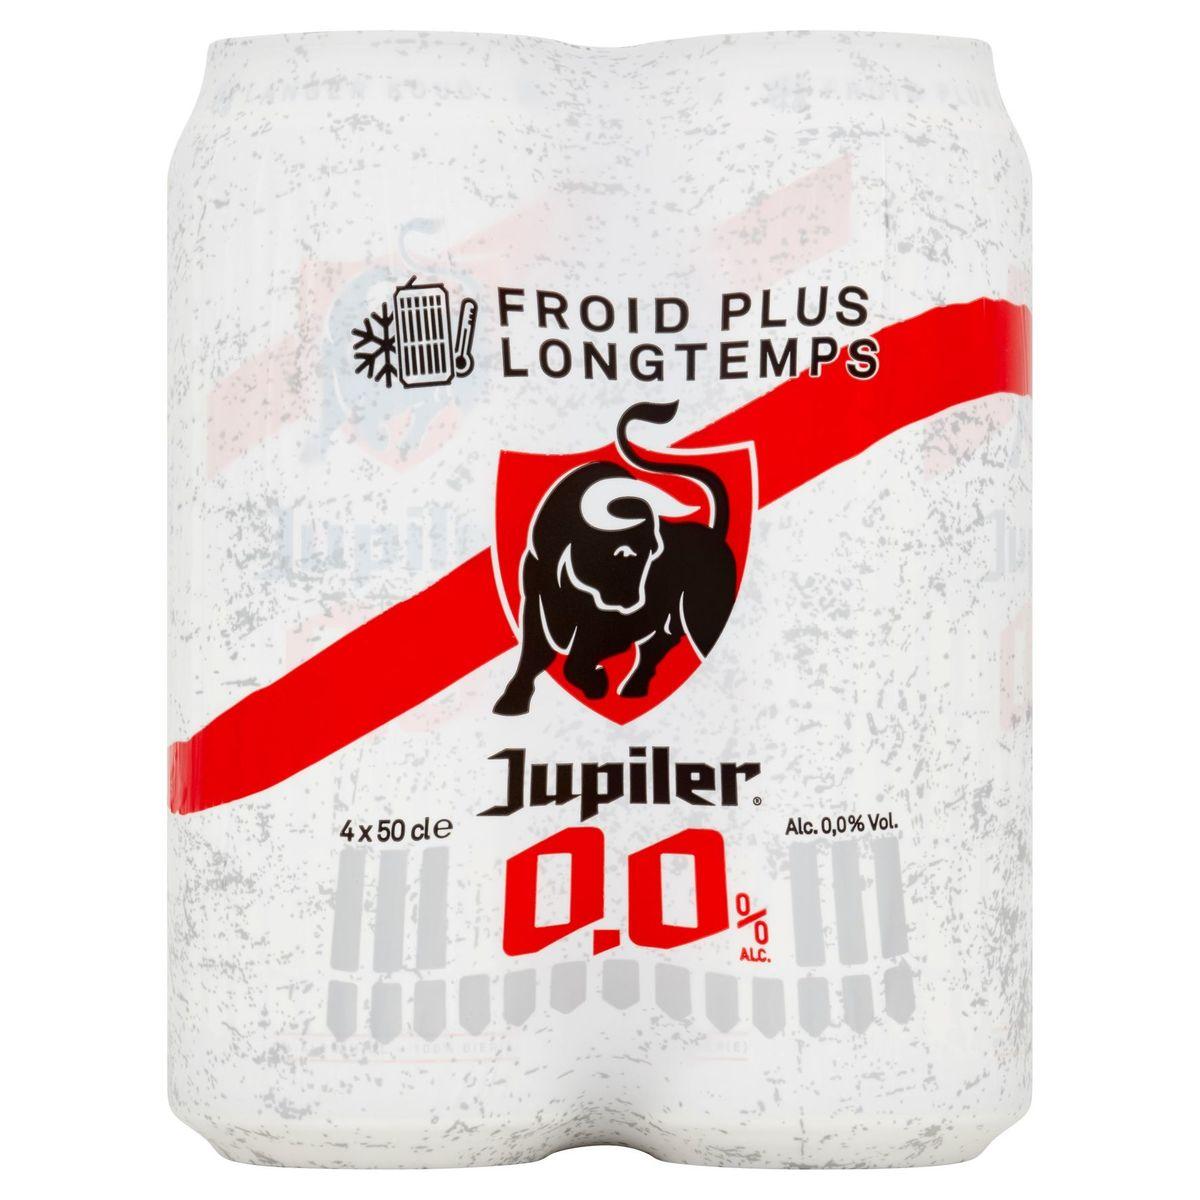 Jupiler 0.0% Alc. Canettes 4 x 50 cl